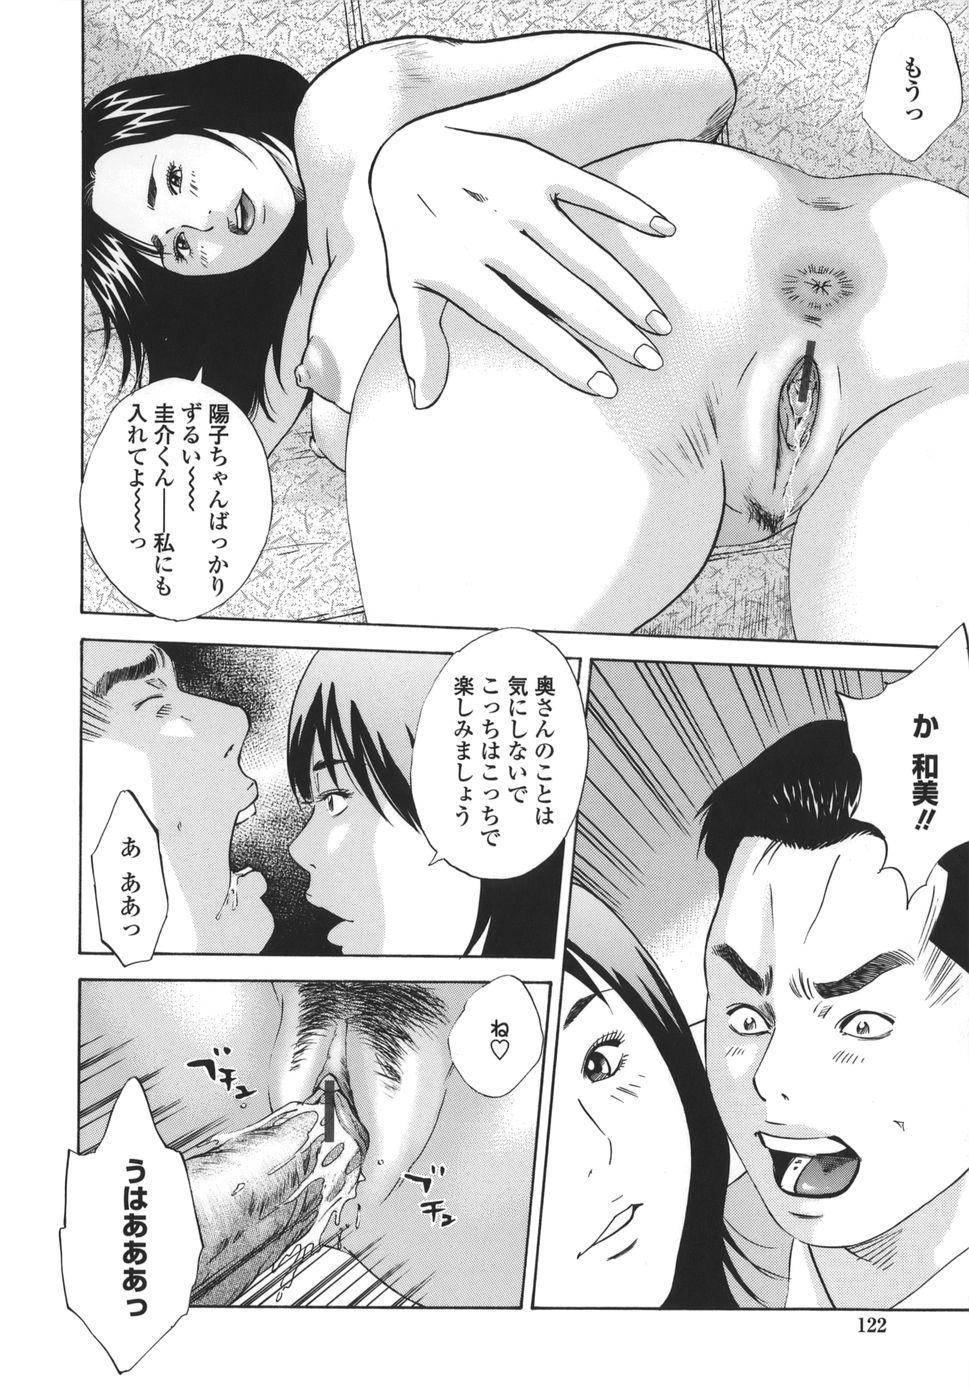 Kinshin Goukan - Near Relation Rapes 121